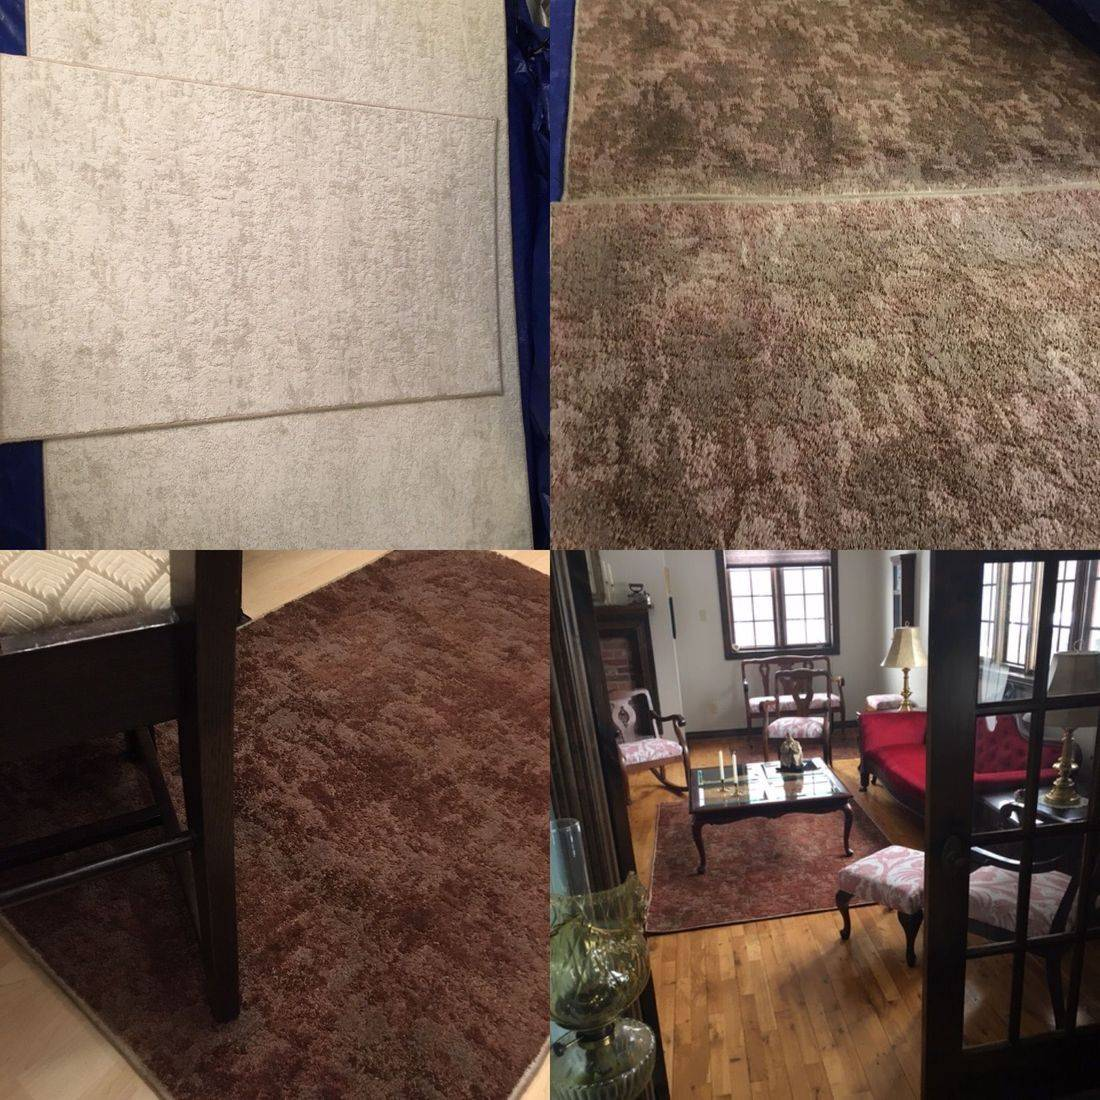 Custom Colour Carpets & Rugs, Carpet Dyeing, Wool Rug, Fluorescent Colour Change